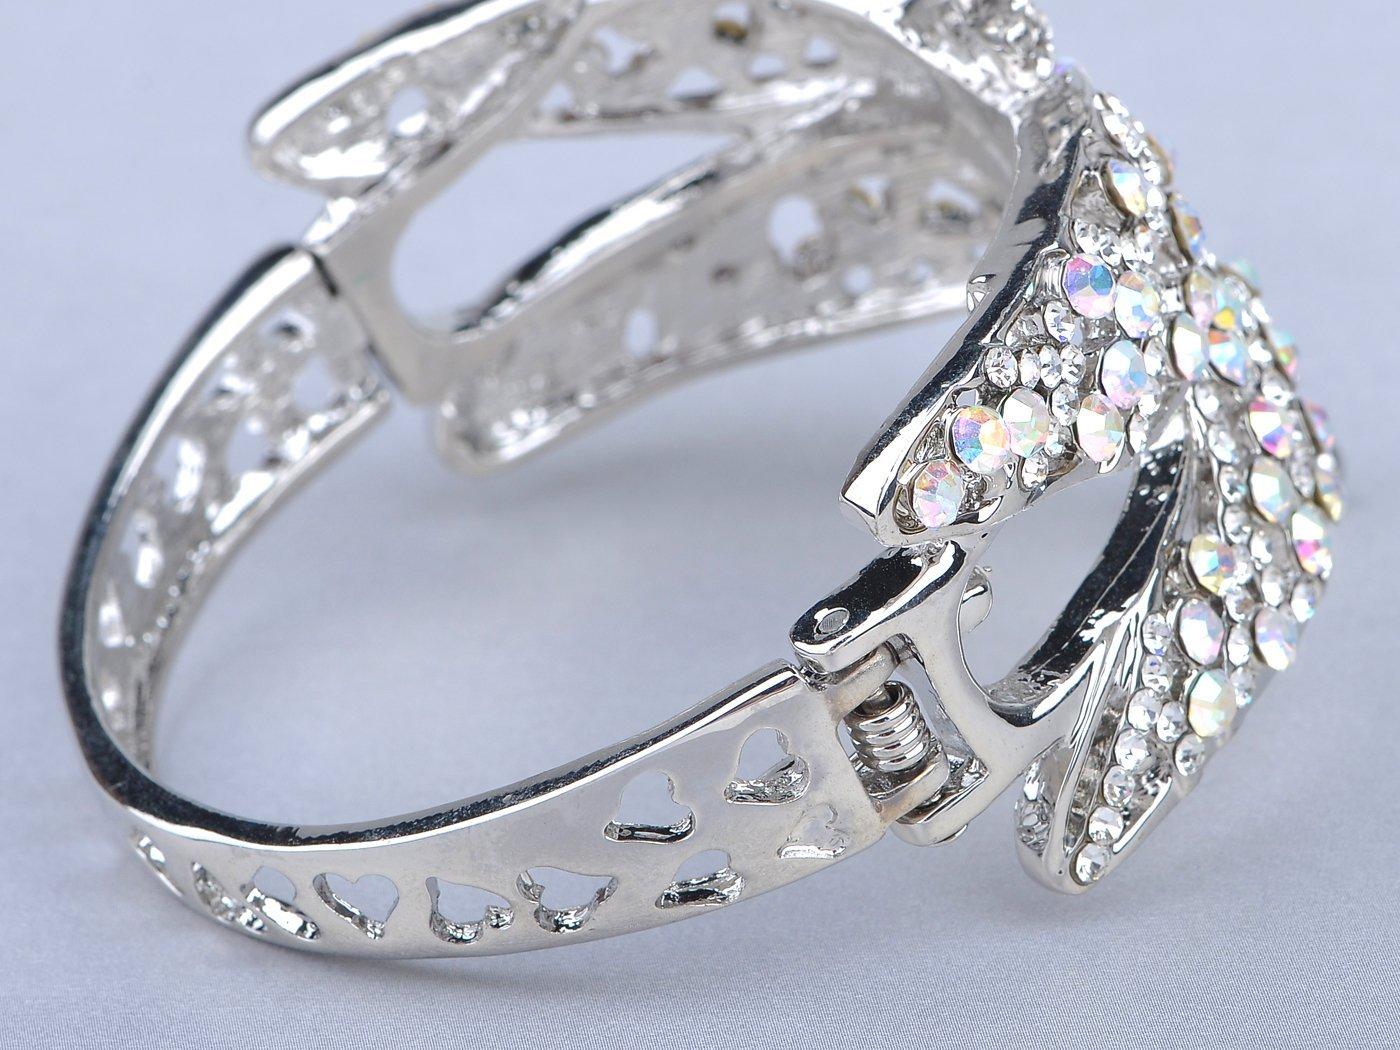 Alilang Womens Silvery Tone Clear Rhinestones Dragonfly Heart Cutout Bangle Bracelet by Alilang (Image #3)